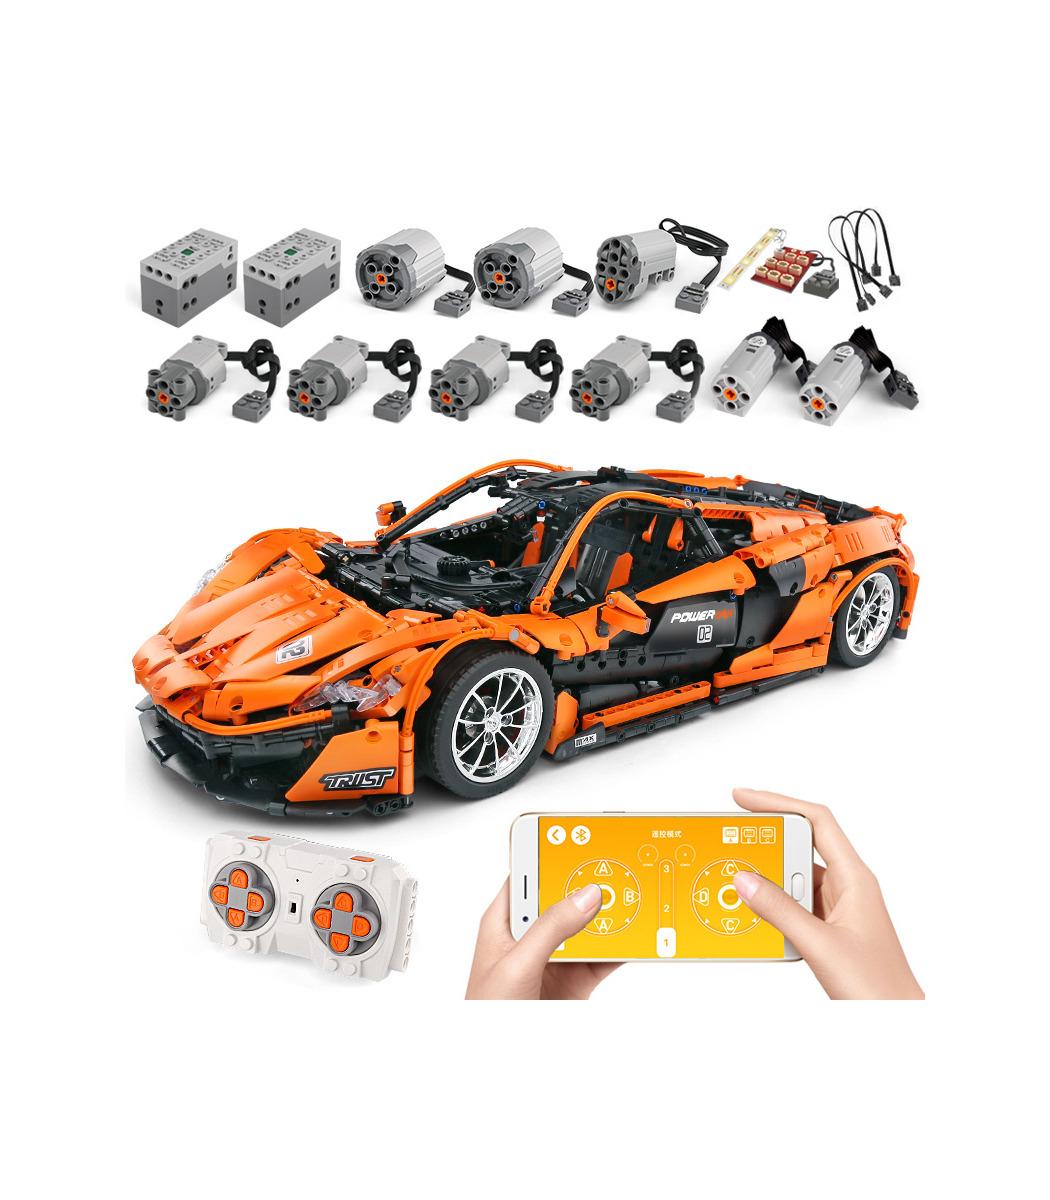 Mould King 13090 Mclaren P1, Klemmbaustein, 9-fach motorisiert, Kohlefaserwellen, LED Beleuchtung, 1:8, 3228 Teile (ohne Motor/LED 104,50€)